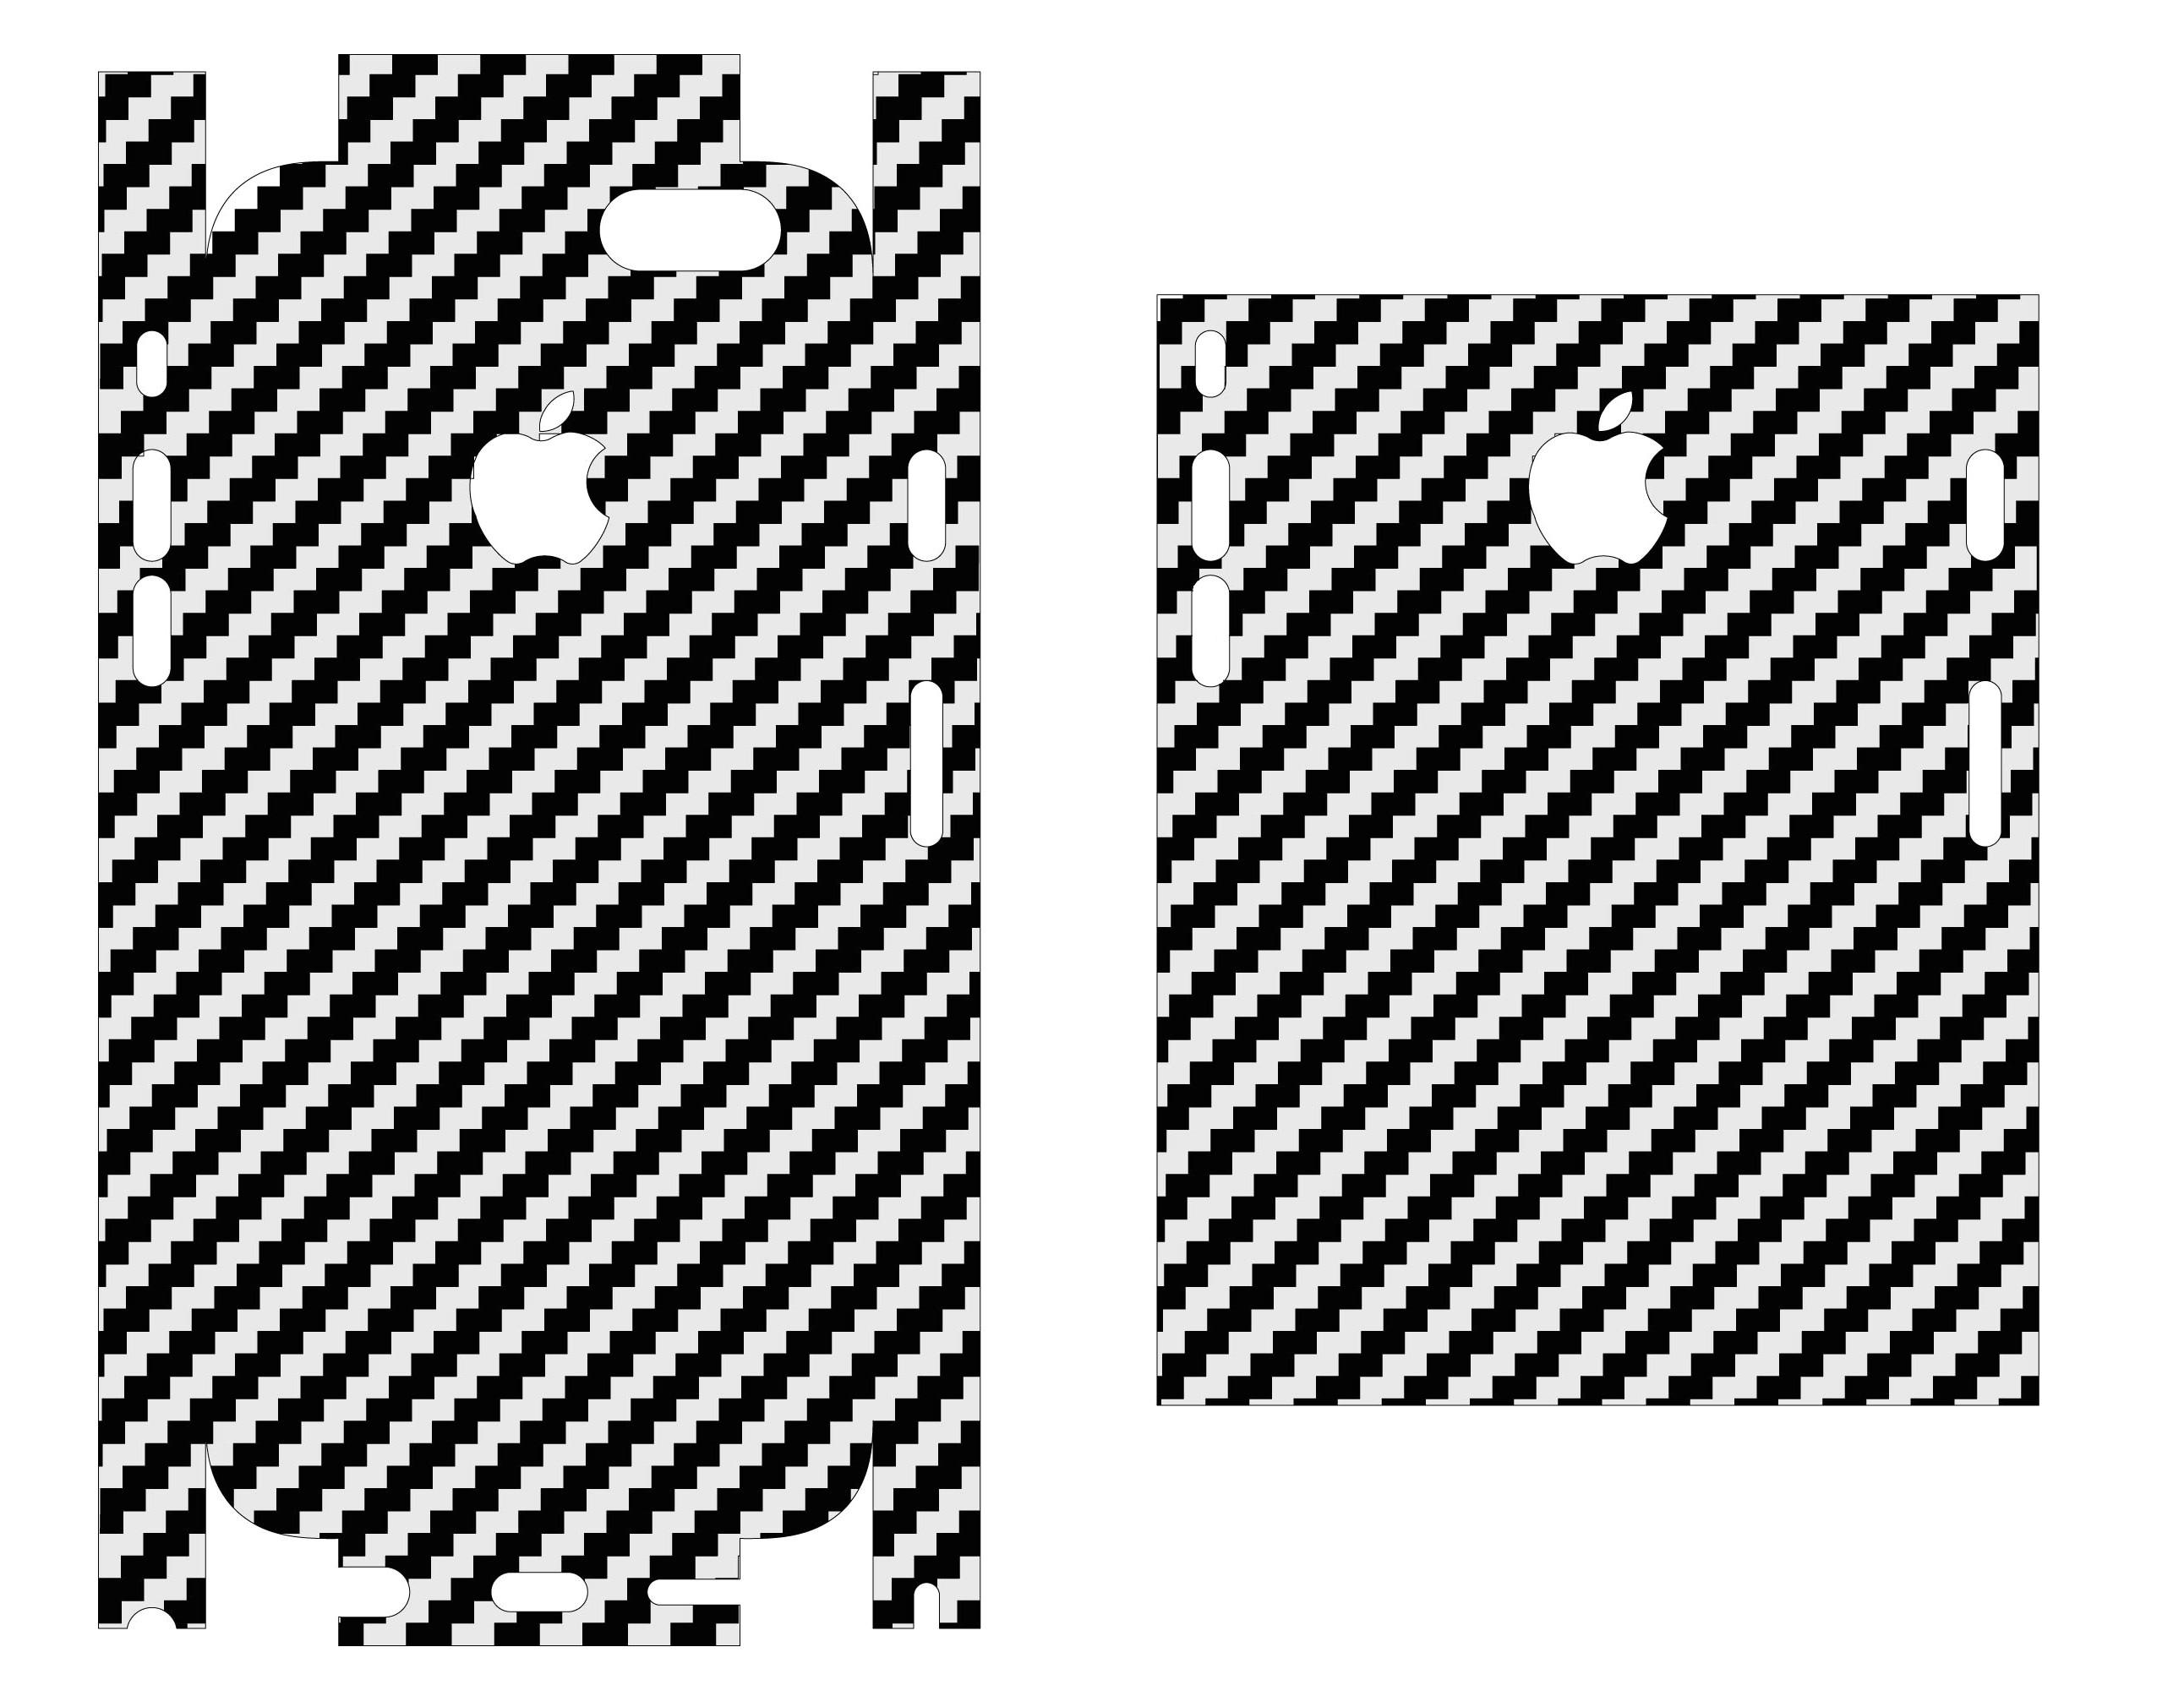 Vinyl Cutter Templates iPhone Templates for Cnc Vinyl Cutting Freelance Cad